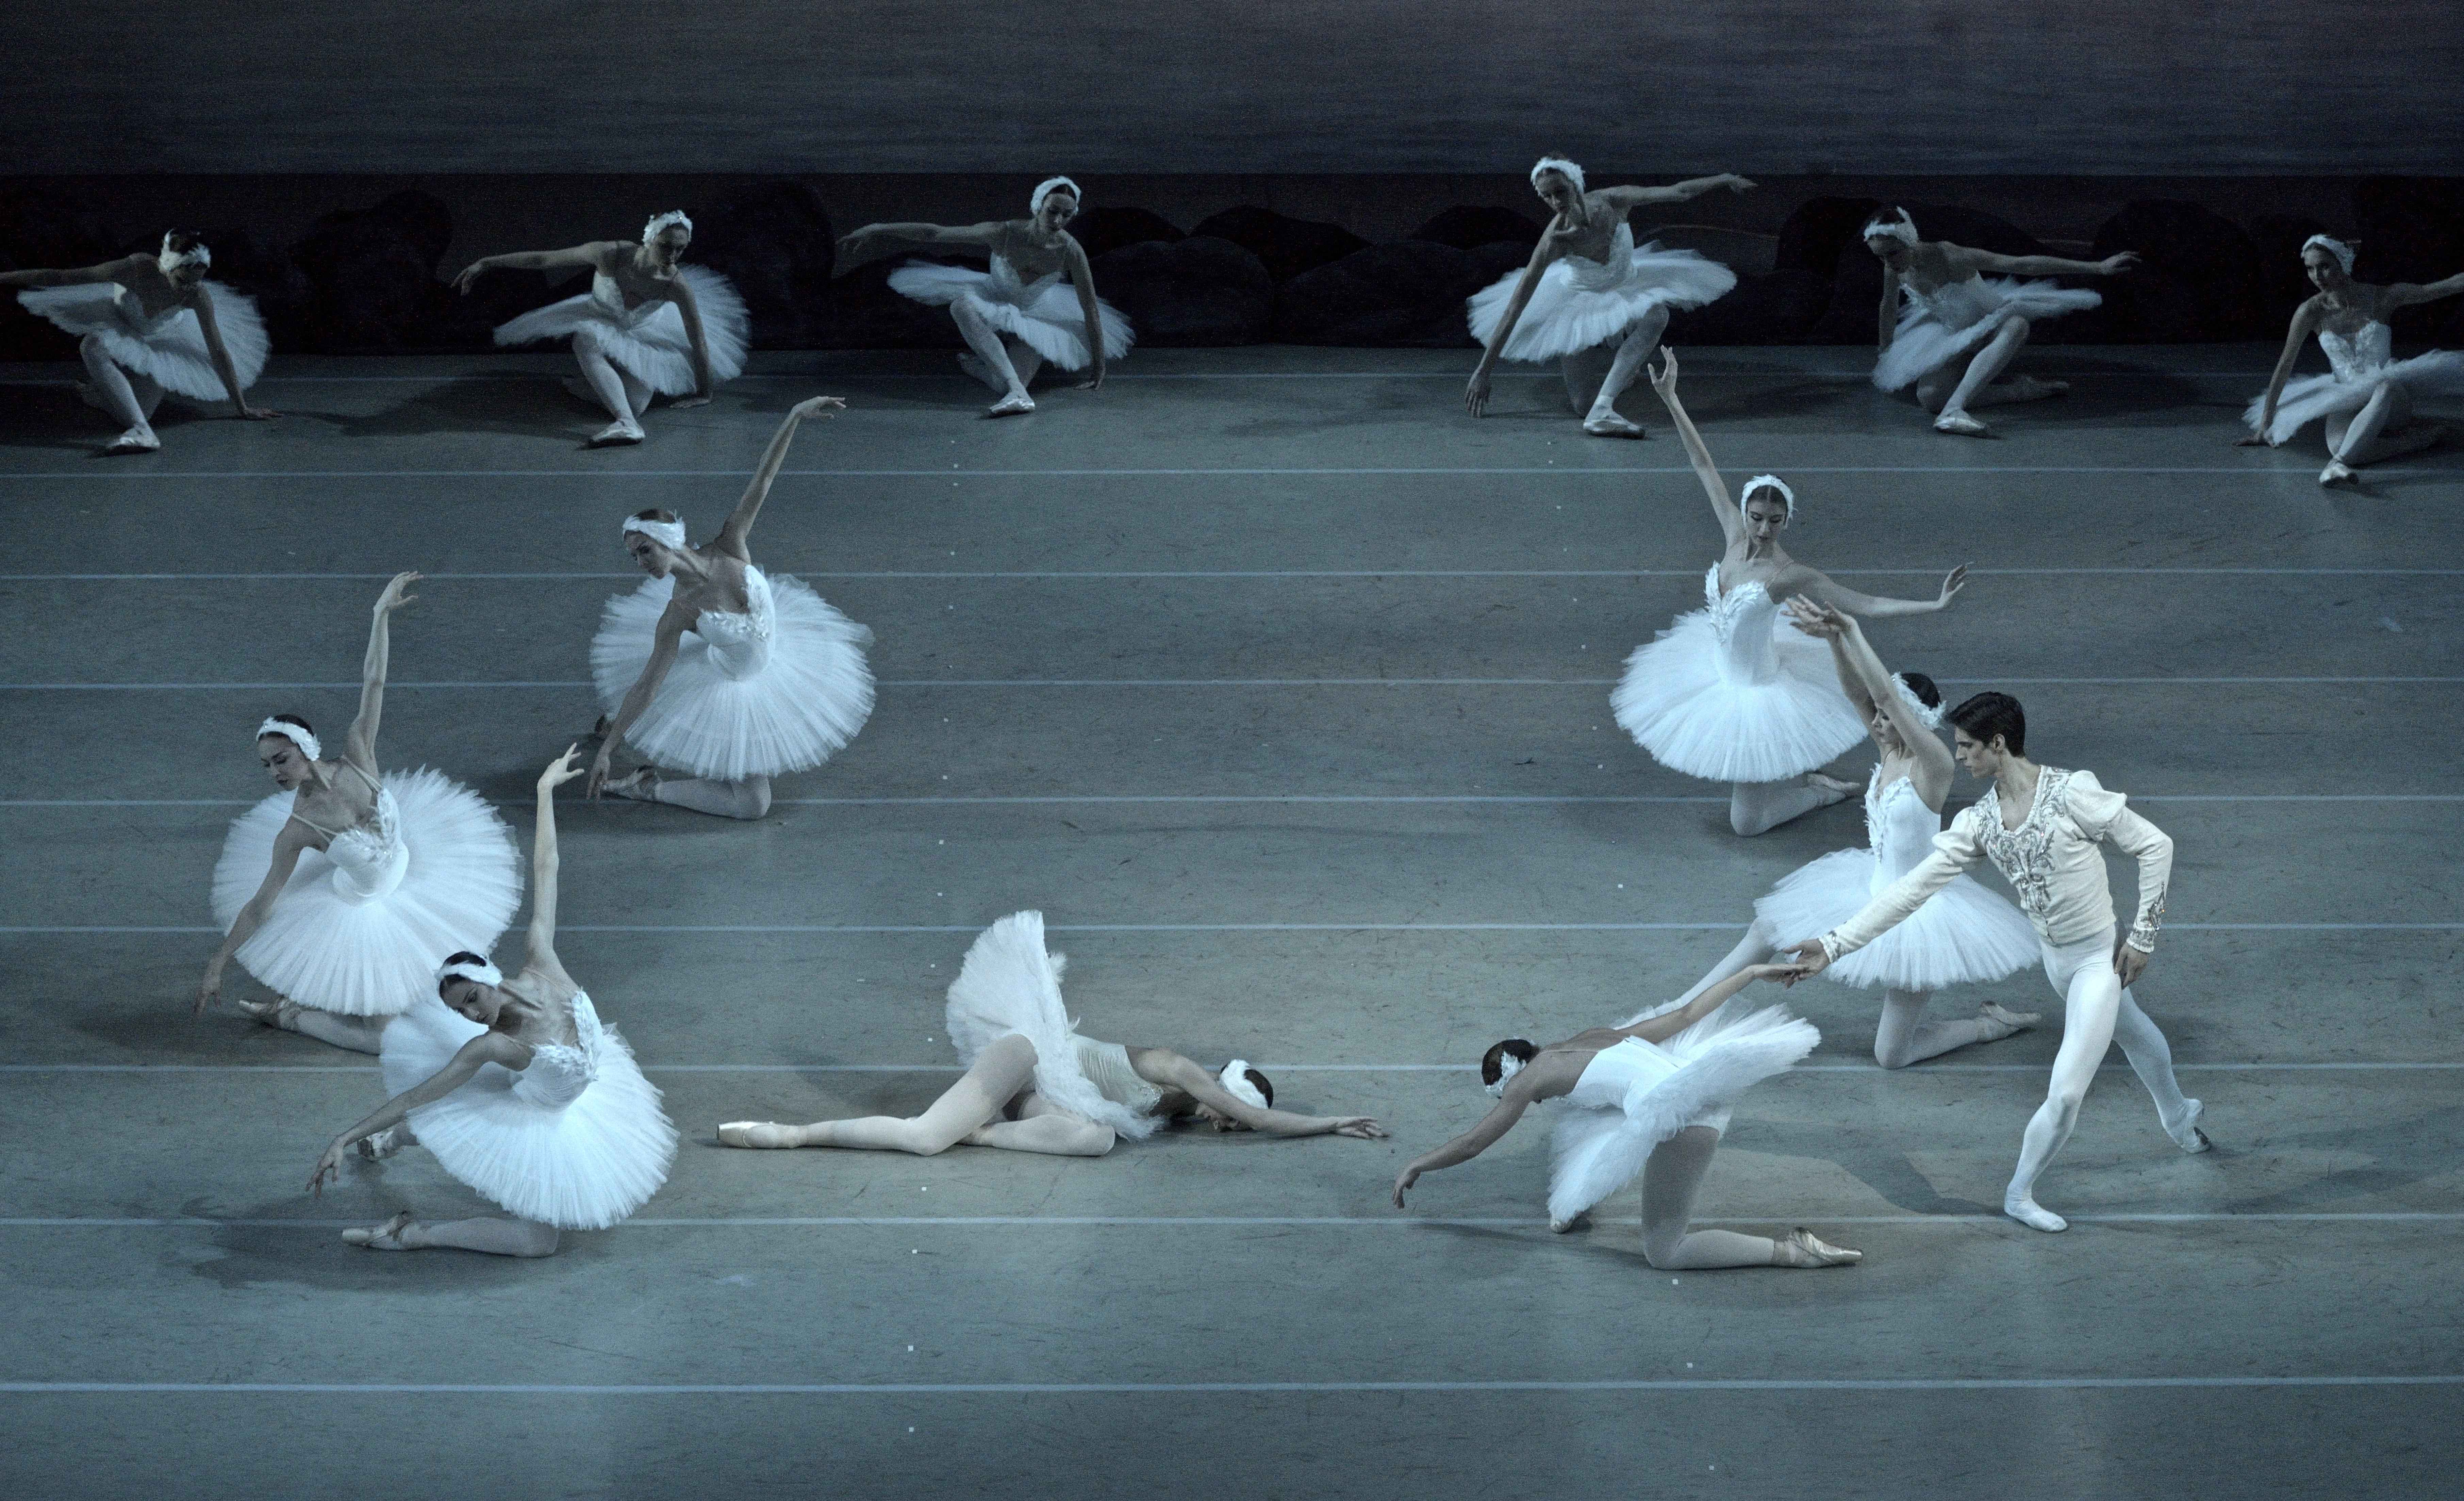 swan-lake-valentin-baranovsky-1